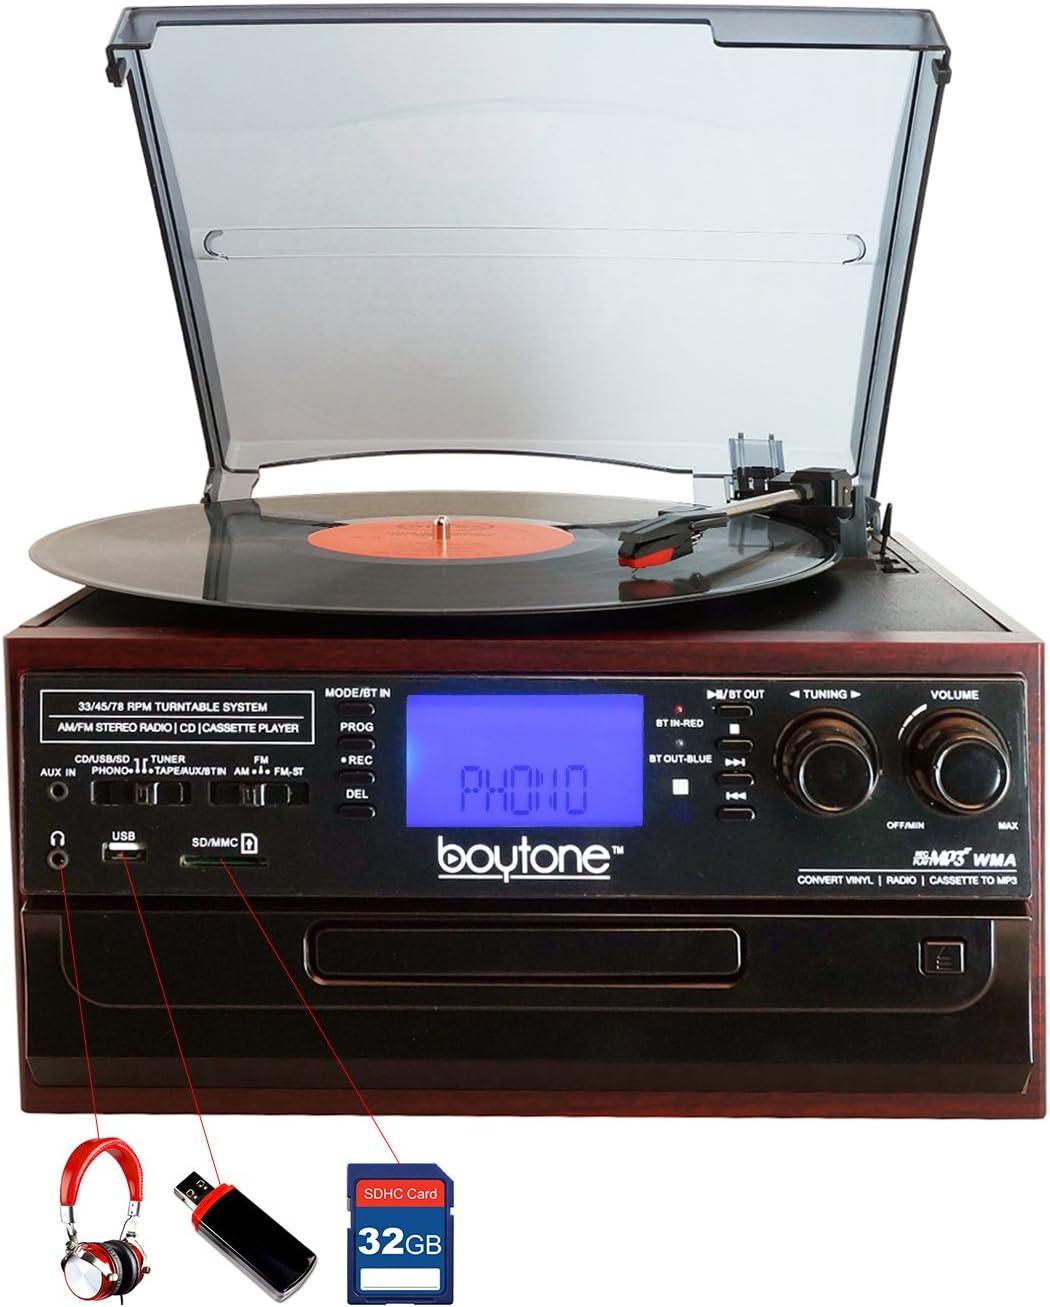 Boytone BT-22C, Bluetooth Record Player Turntable, AM/FM Radio, Cassette, CD Player, 2 Built in Speaker, Ability to Convert Vinyl, Radio, Cassette, CD ...